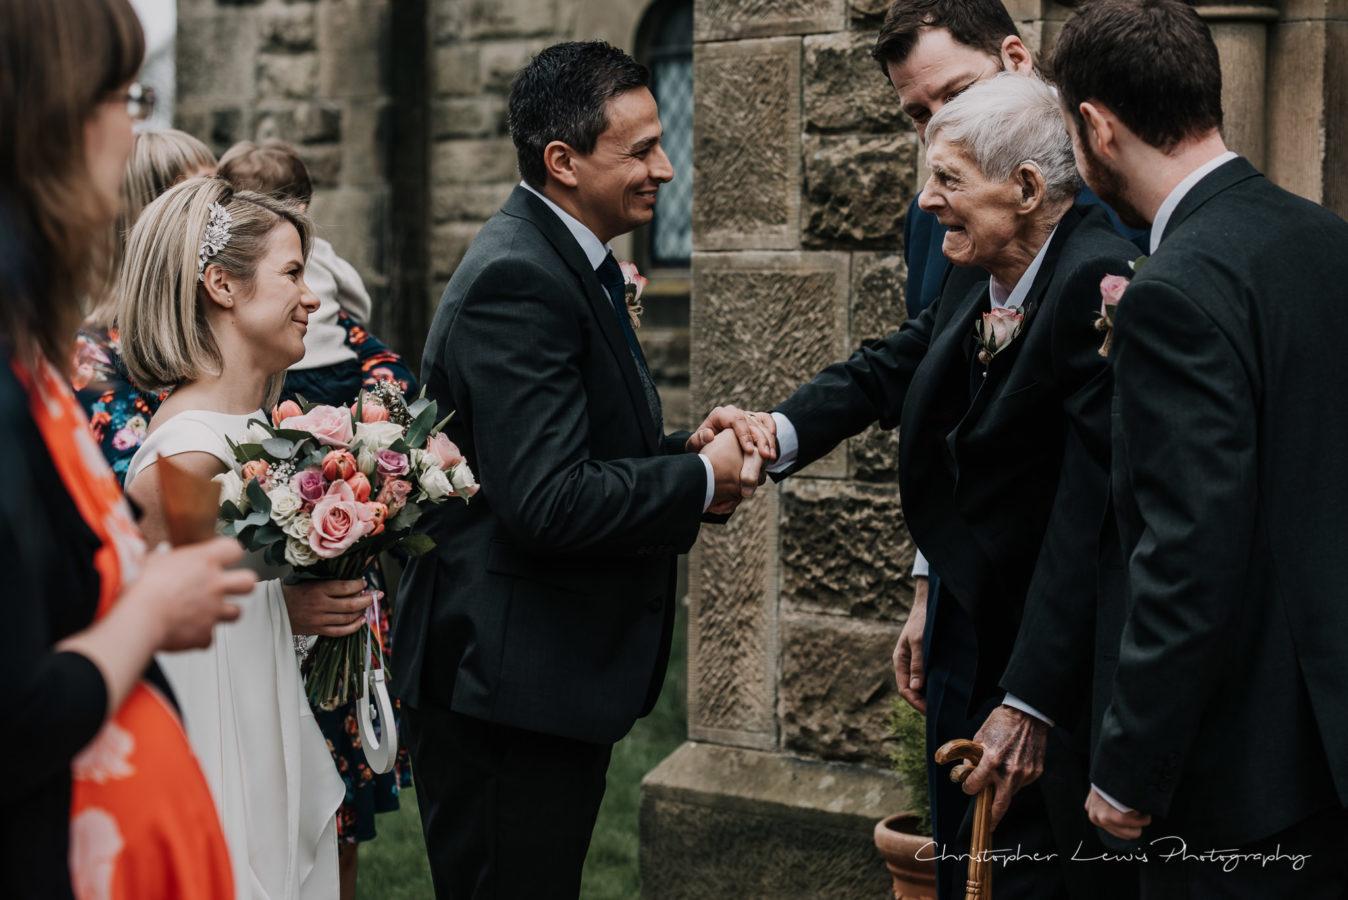 Thief-Hall-Wedding-Christopher-Lewis-Photography-35